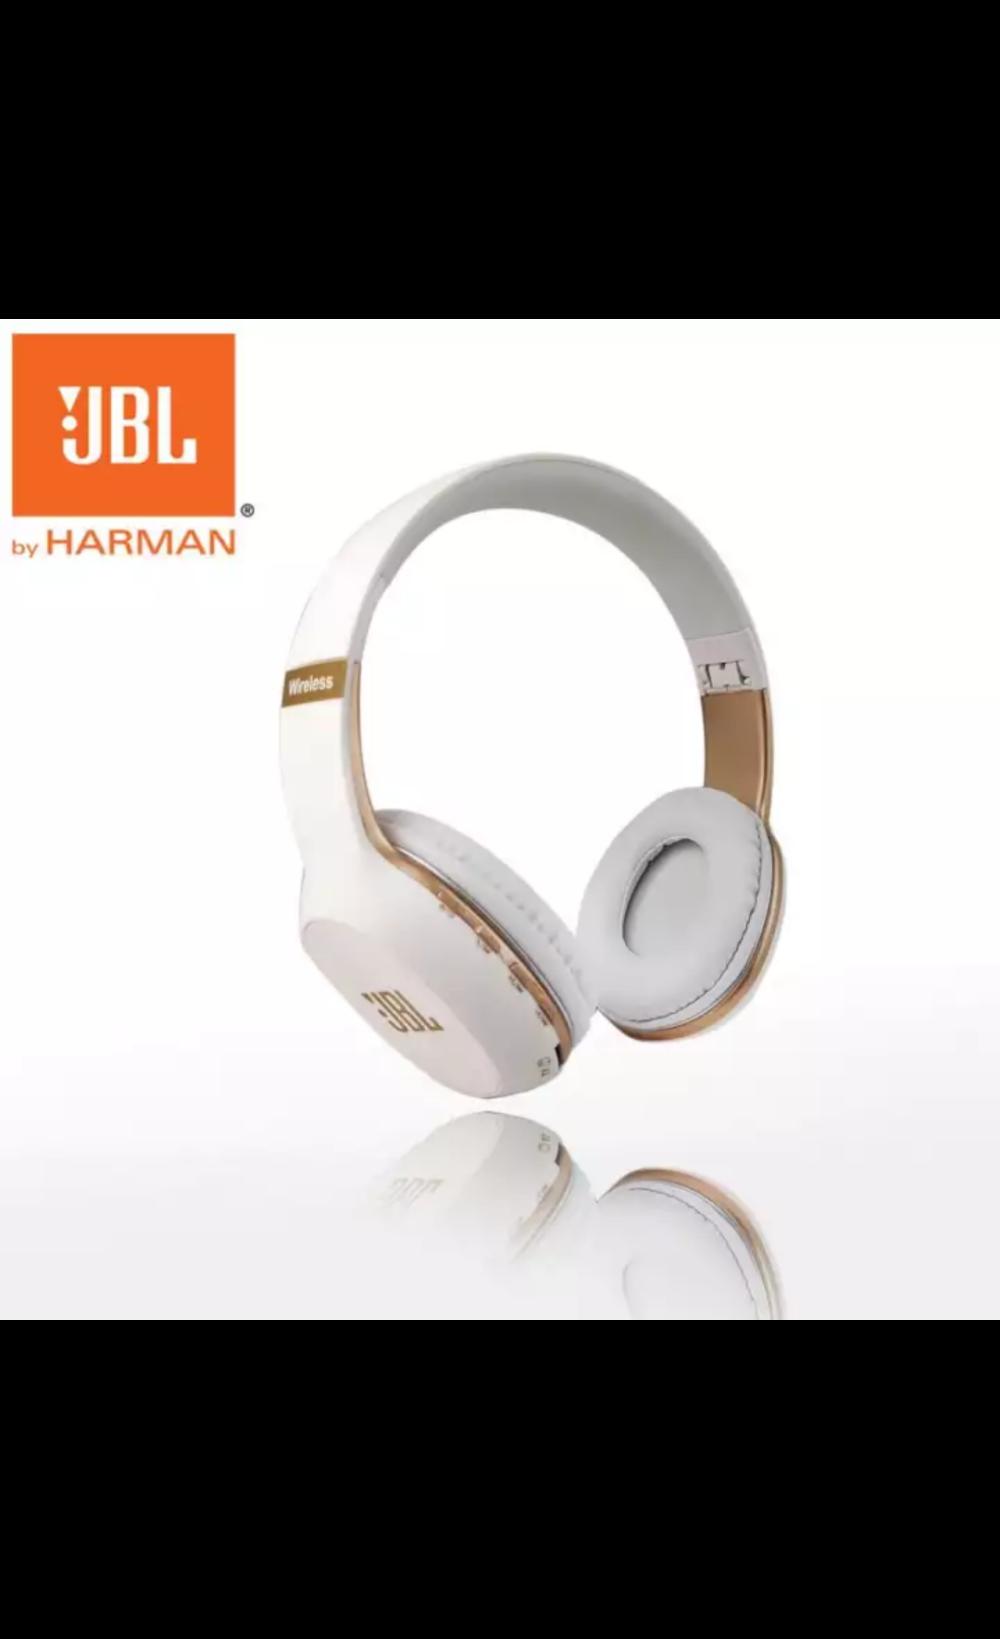 Jbl 951bt Bluetooth Base Headset Buy Resell 80 Tryzongomart Accra Ghana Affordable Zongomart Bluetooth Design Sony Headphones Wireless Headphones